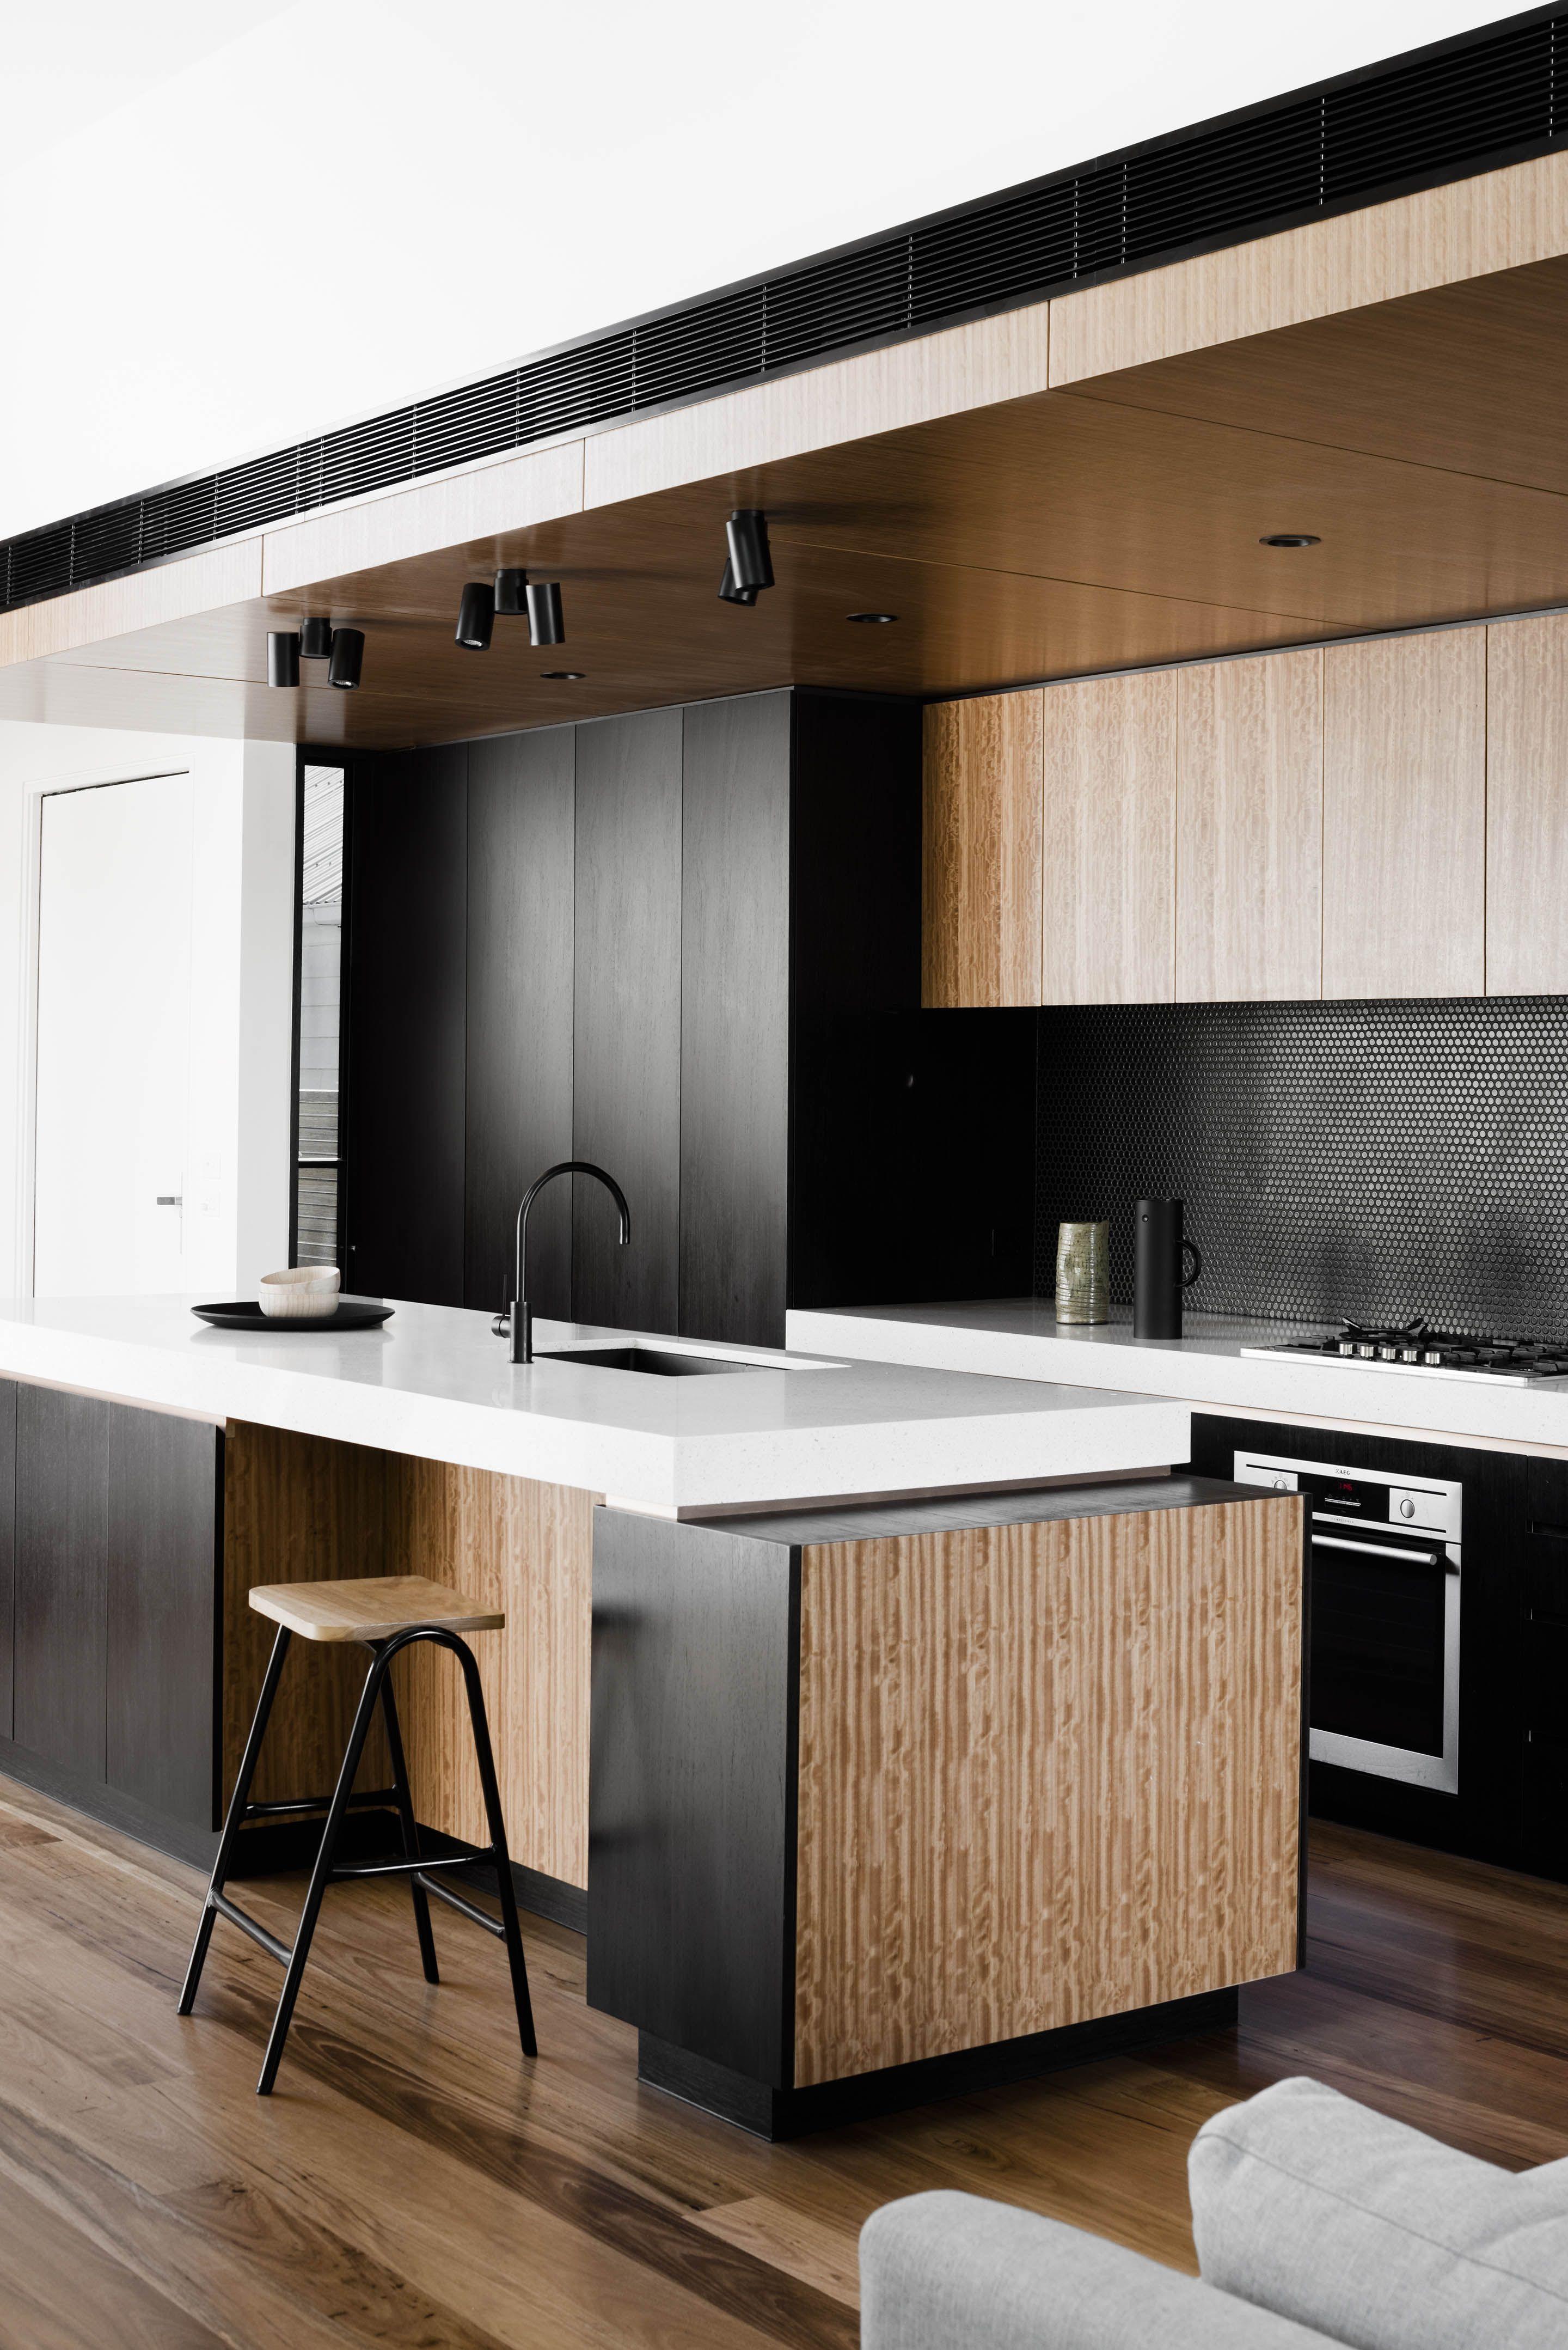 Related Image Kitchenroomimages Dream Kitchens Design Timber Kitchen Modern Kitchen Design